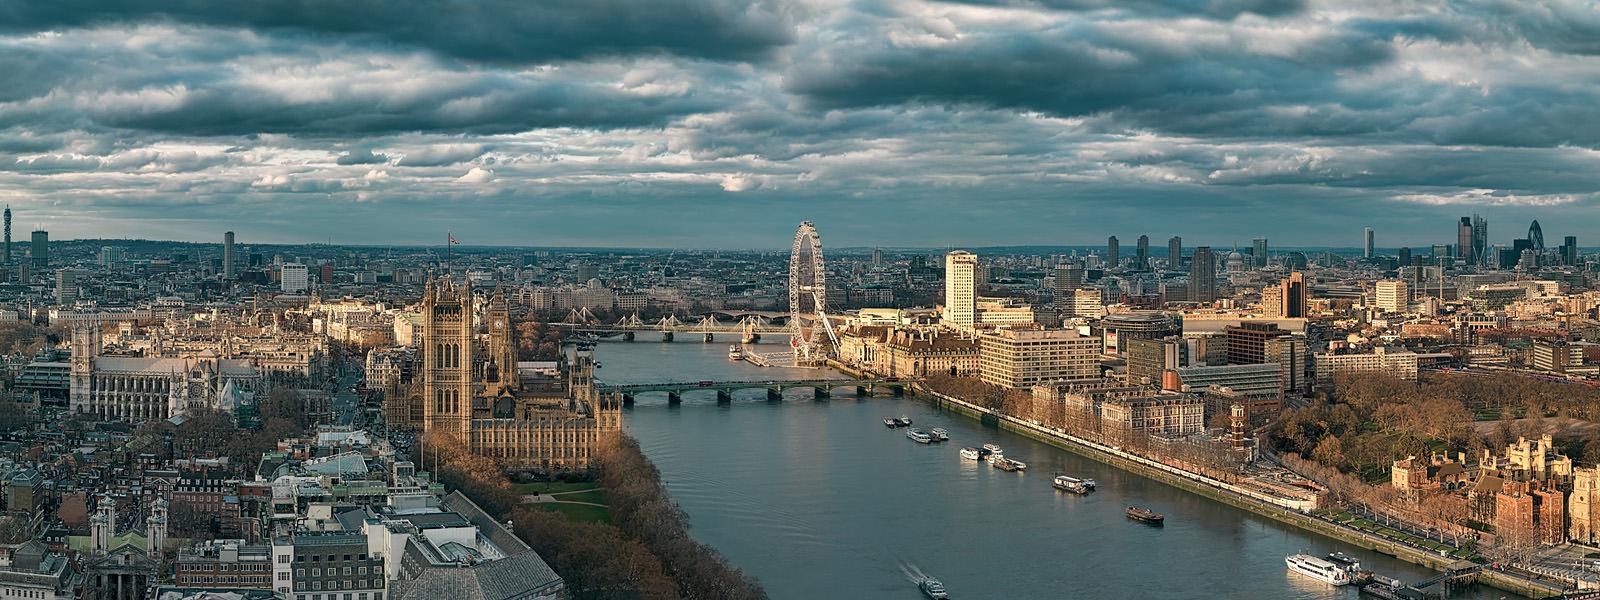 Sunlit London Acrylic - Frameless mounted London Cityscape Fine Art Print